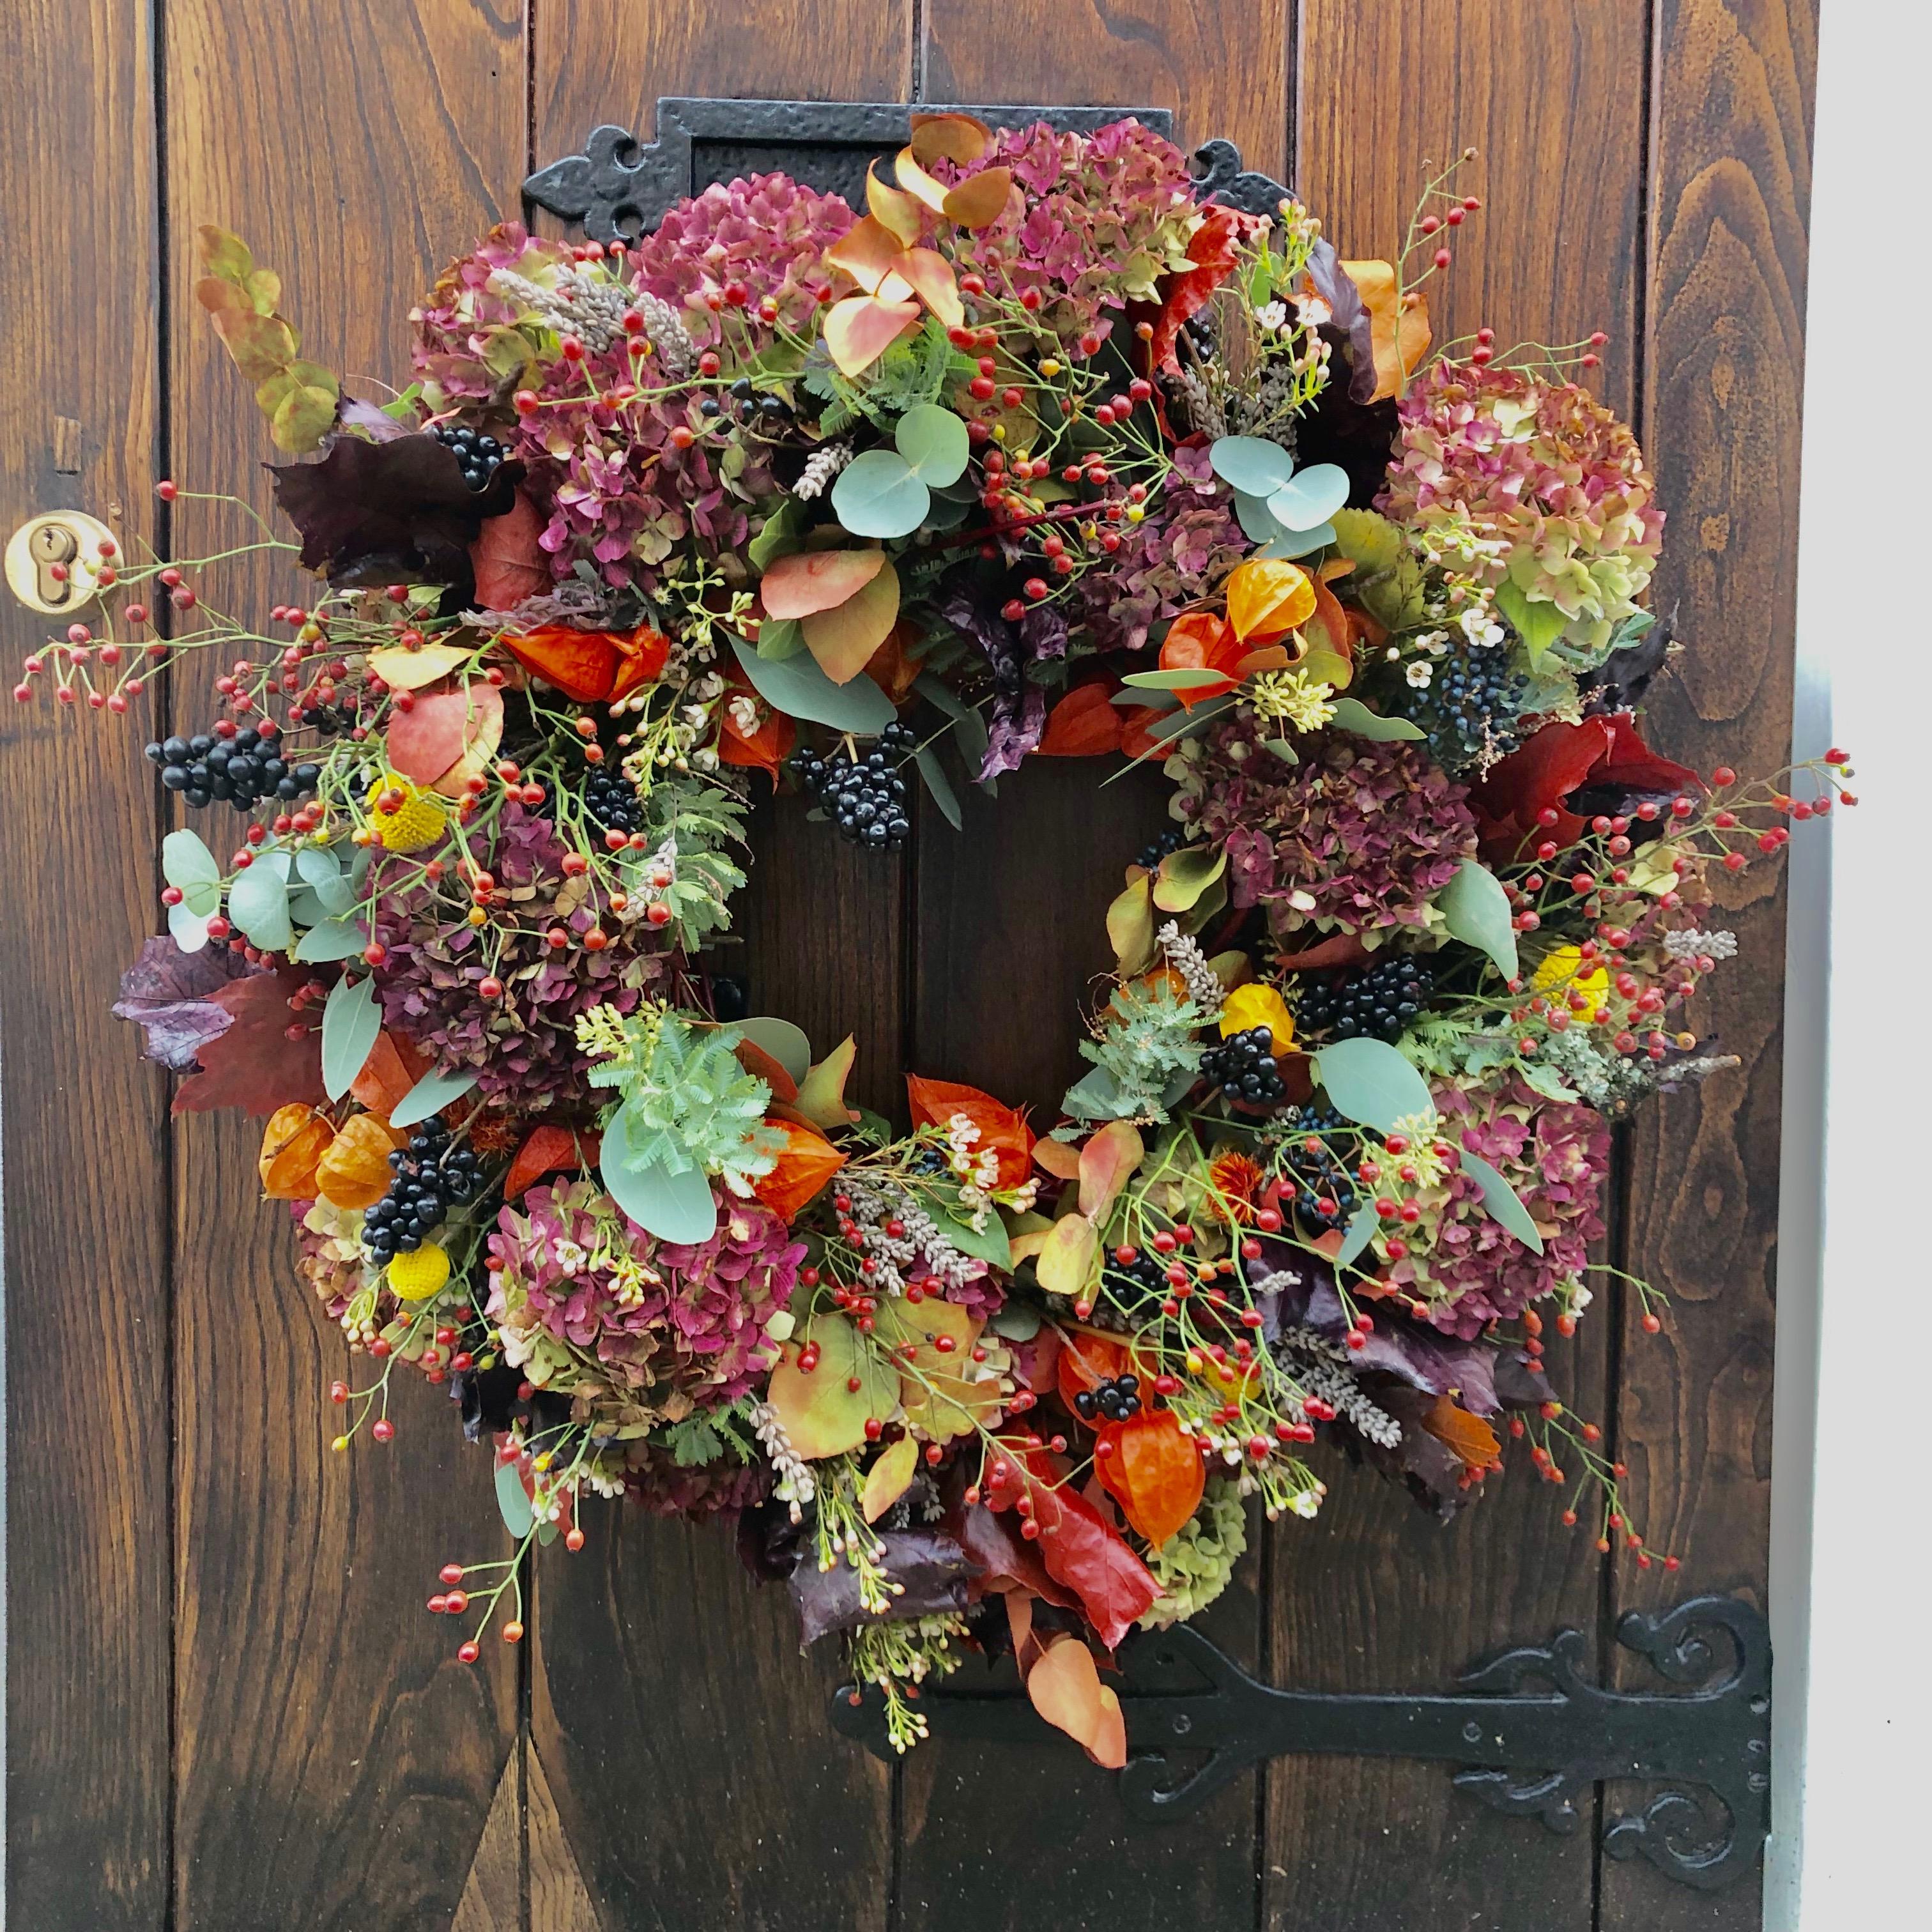 Winter Sunset Festive Wreath